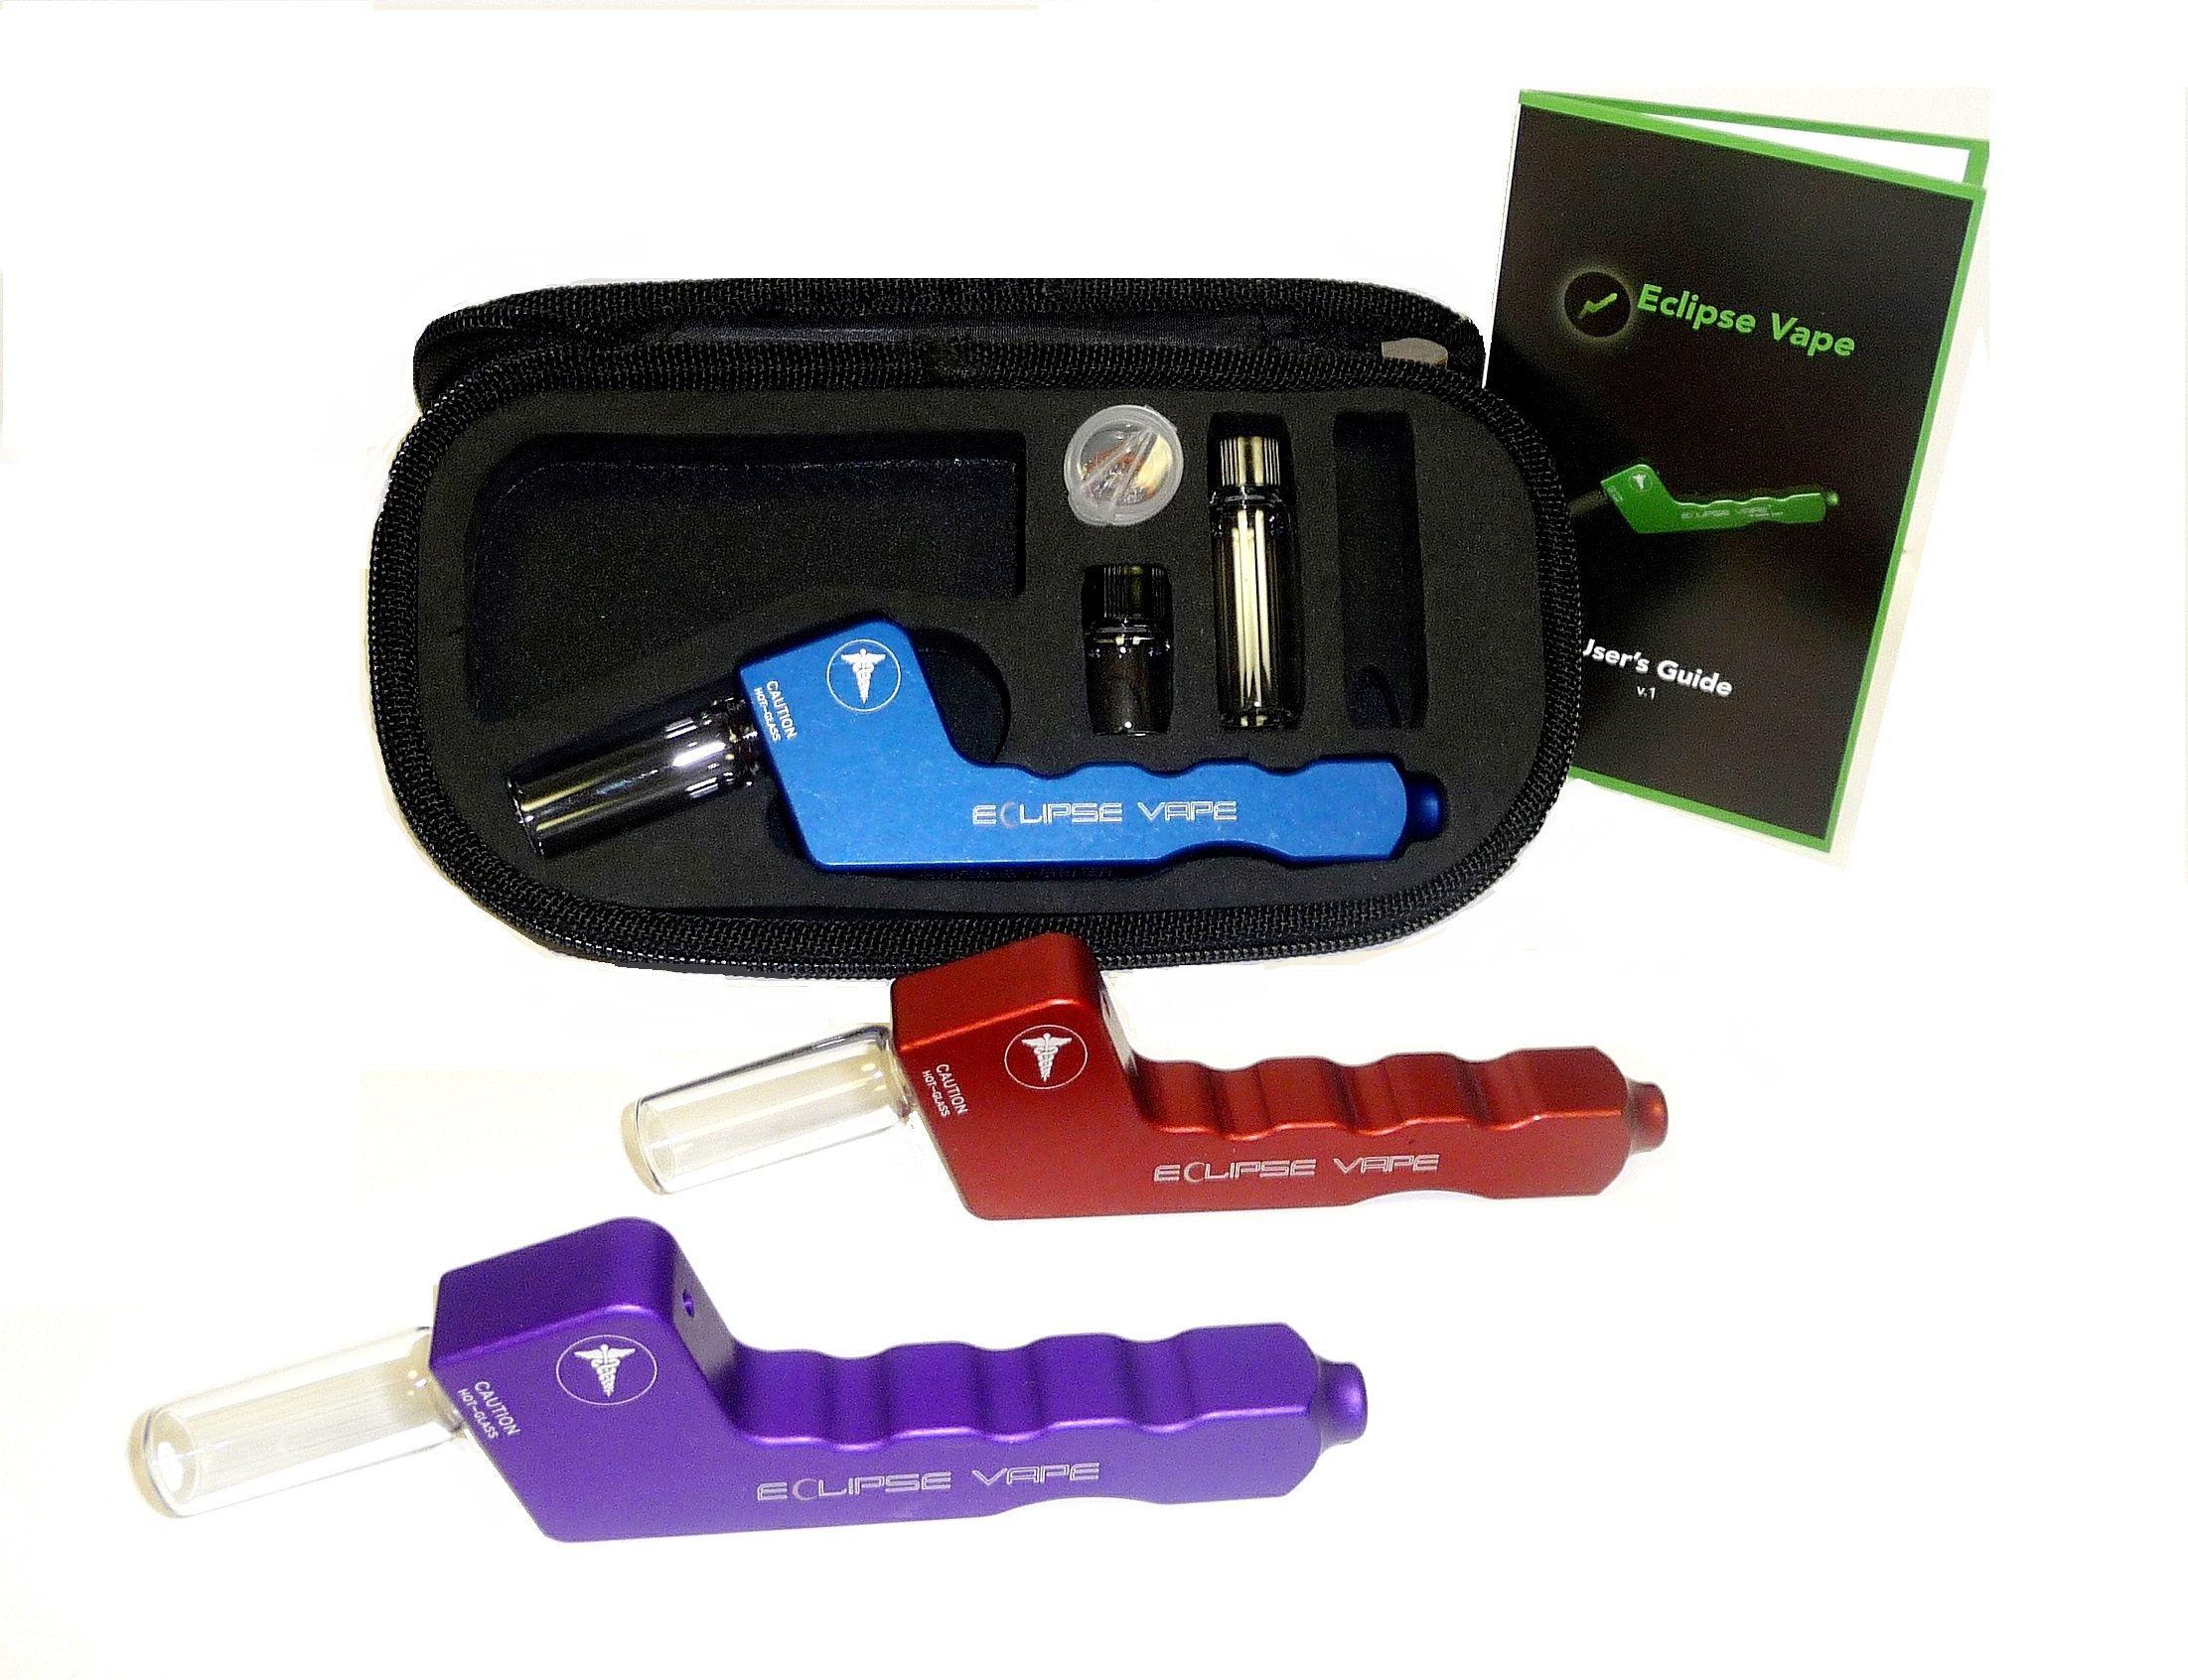 Small Portable Vaporizer ~ Eclipse Essential Vape ~ for Oils